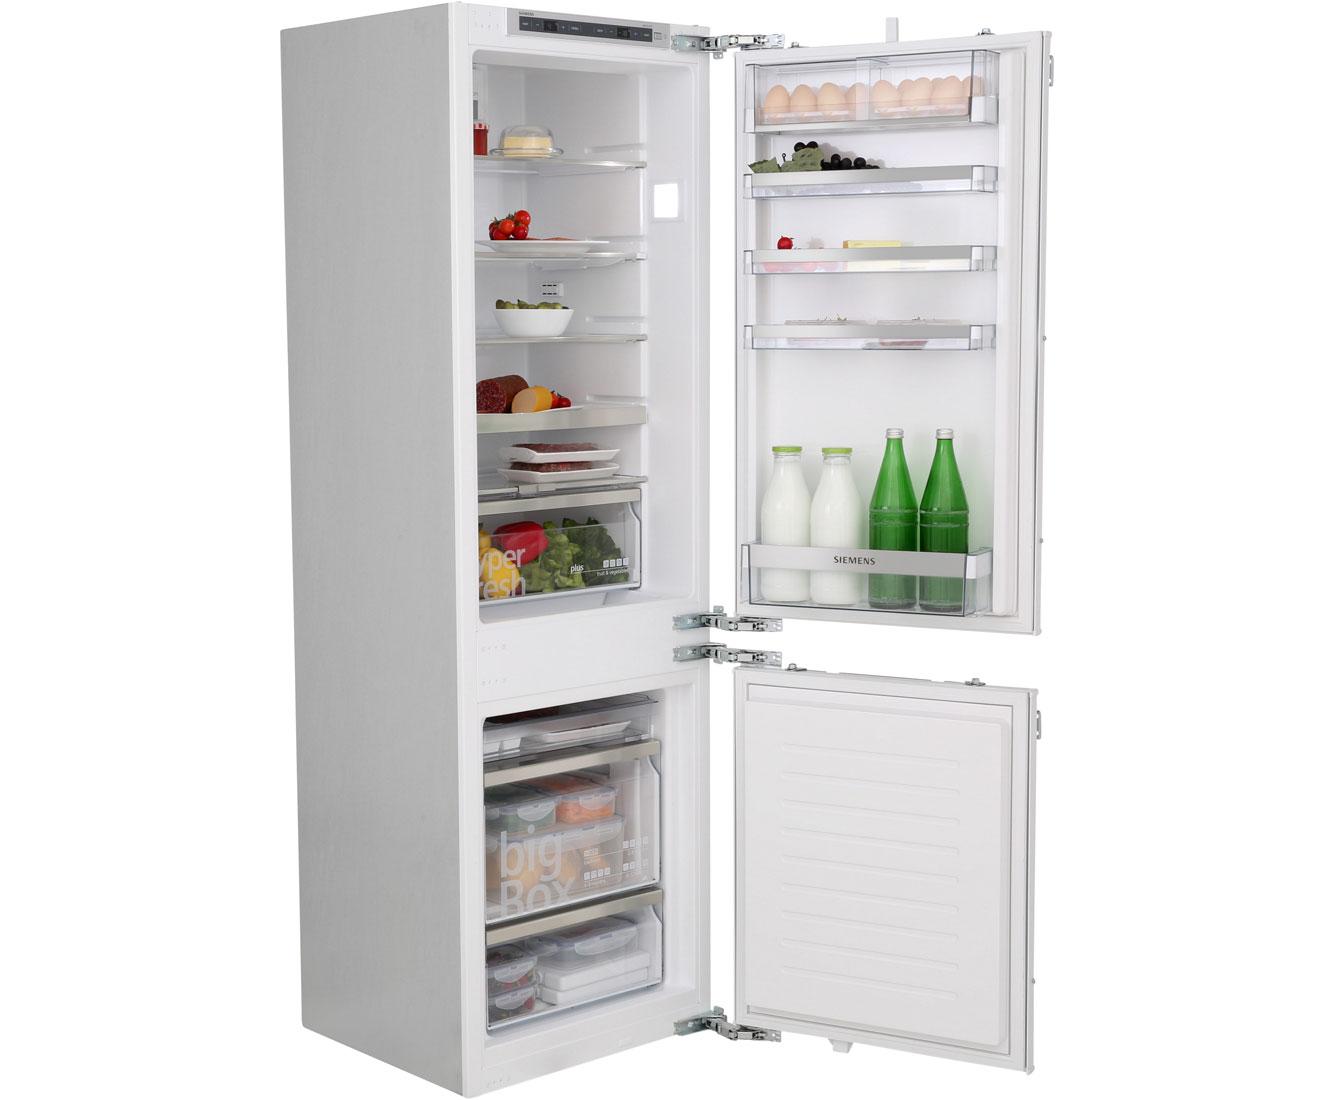 Retro Kühlschrank Notebooksbilliger : Kühl gefrierkombi günstig kühlschrank günstig im check